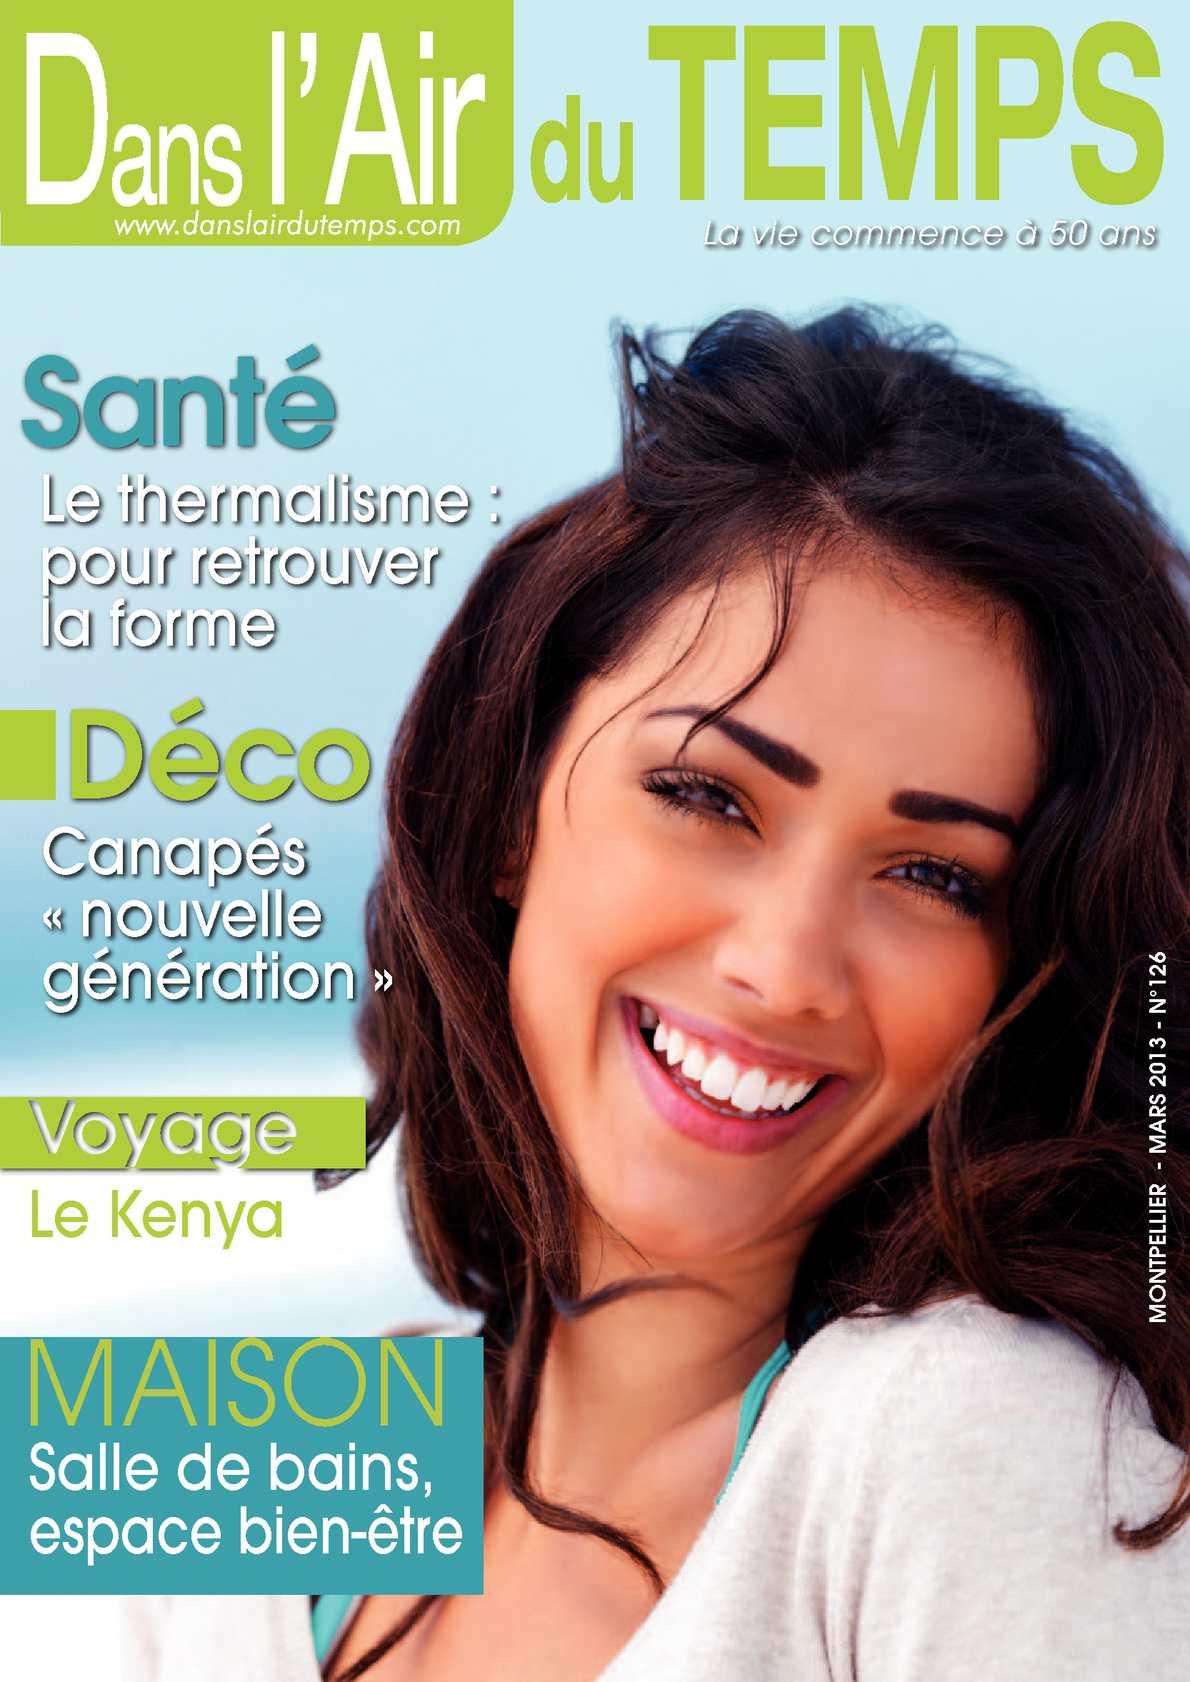 Calaméo - Air du temps Montpellier Mars 2013 N°126 594c88f79d8